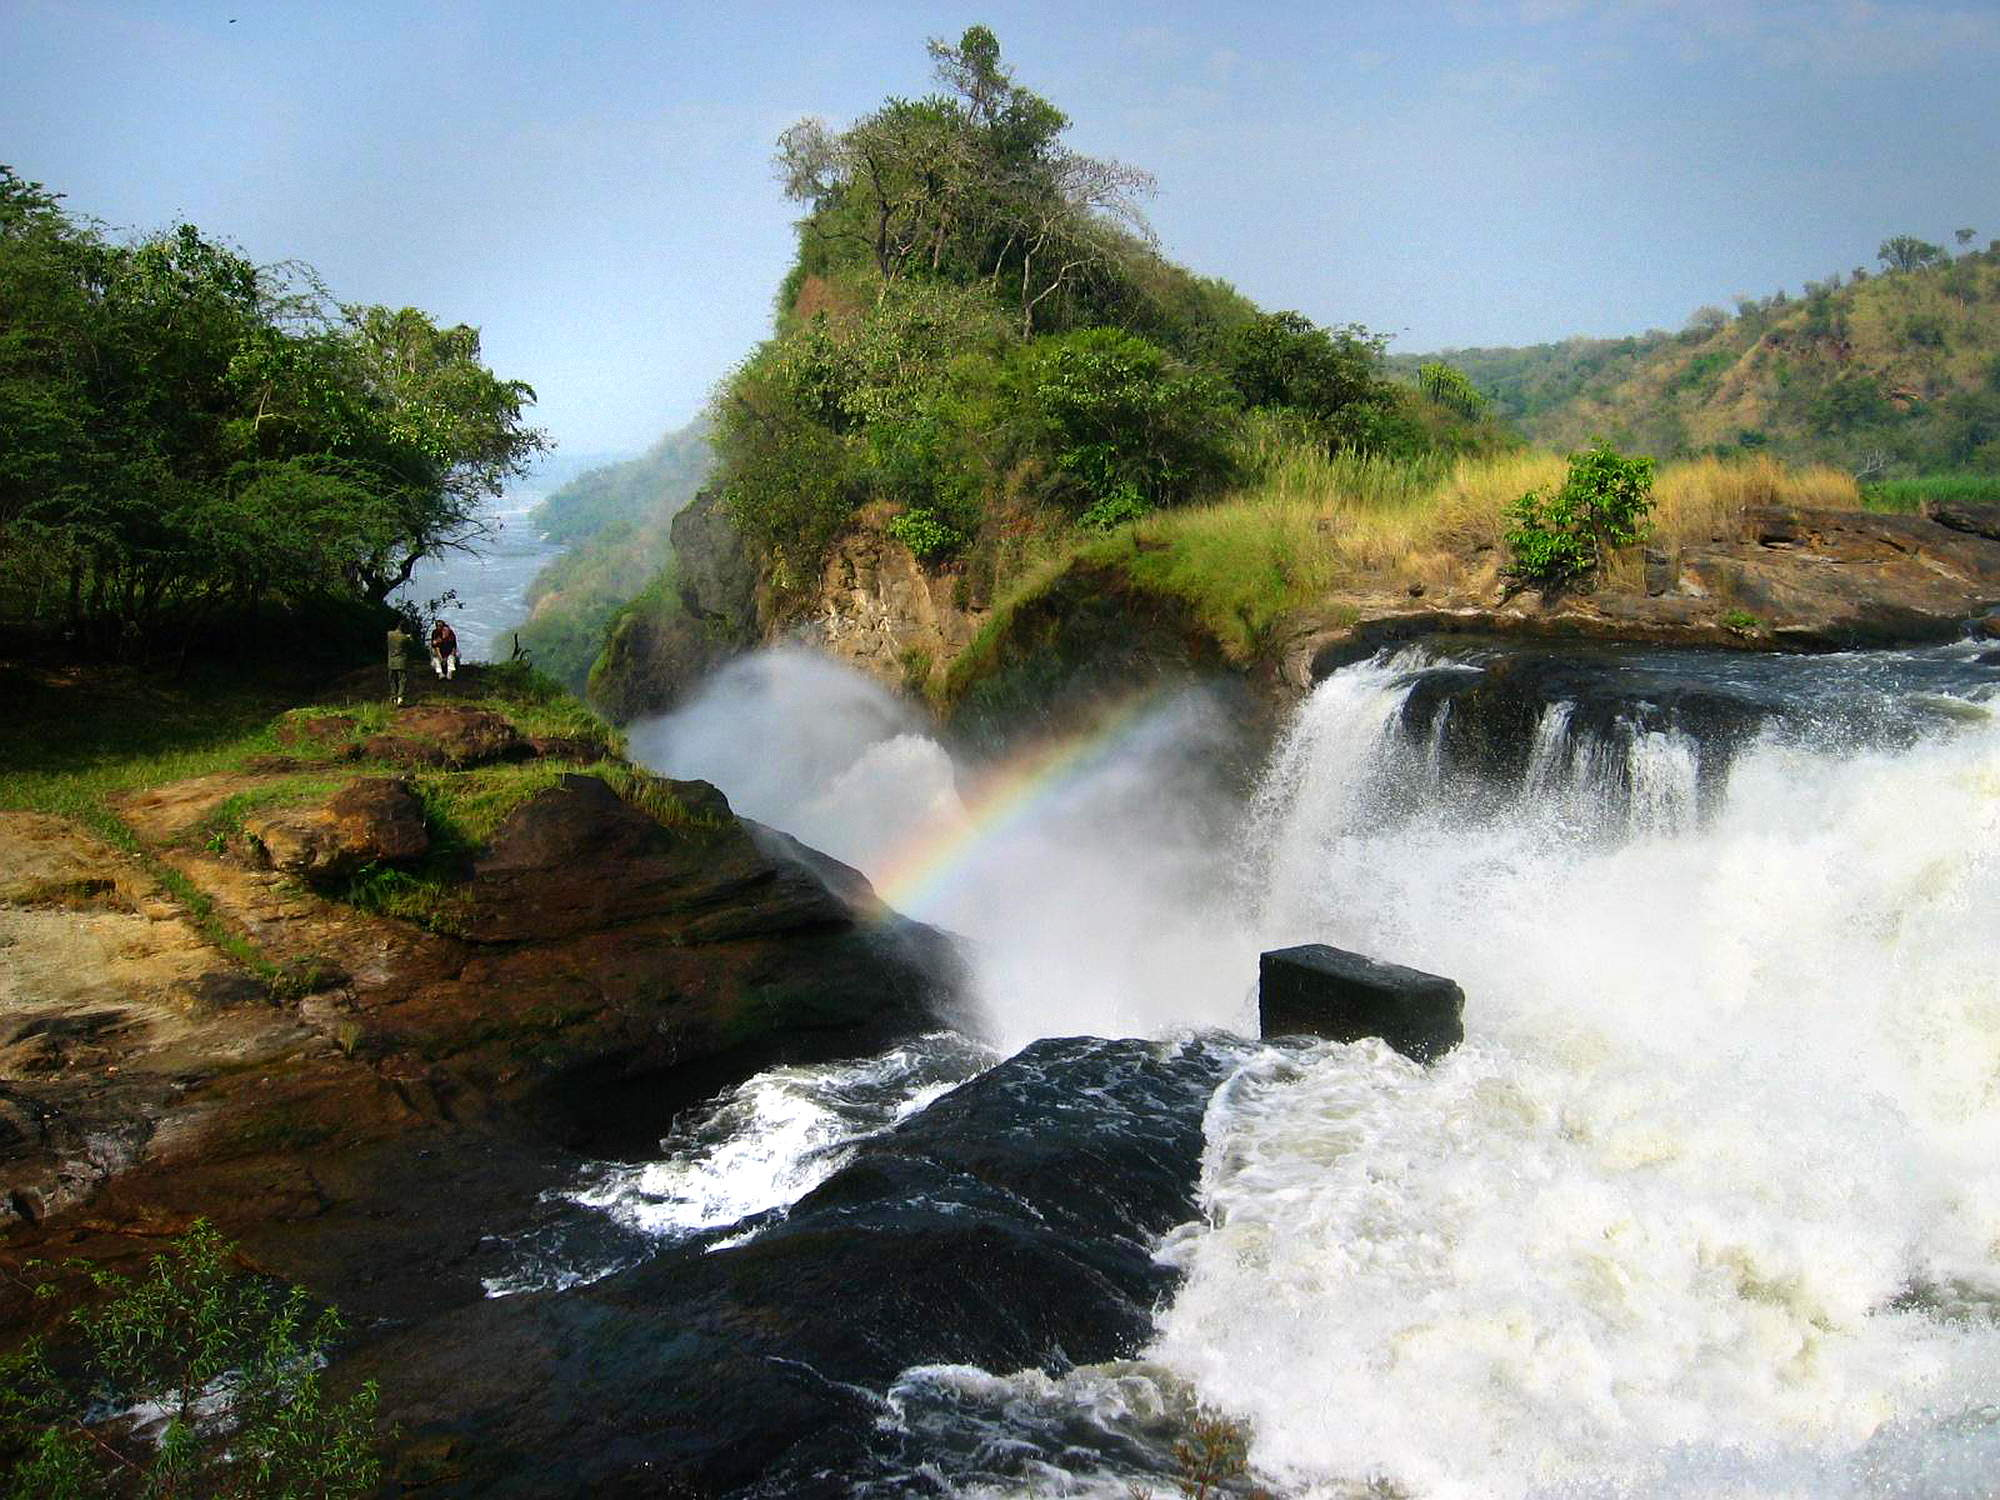 MURCHISON FALLS NATIONAL PARK UGANDA [SAFARI]